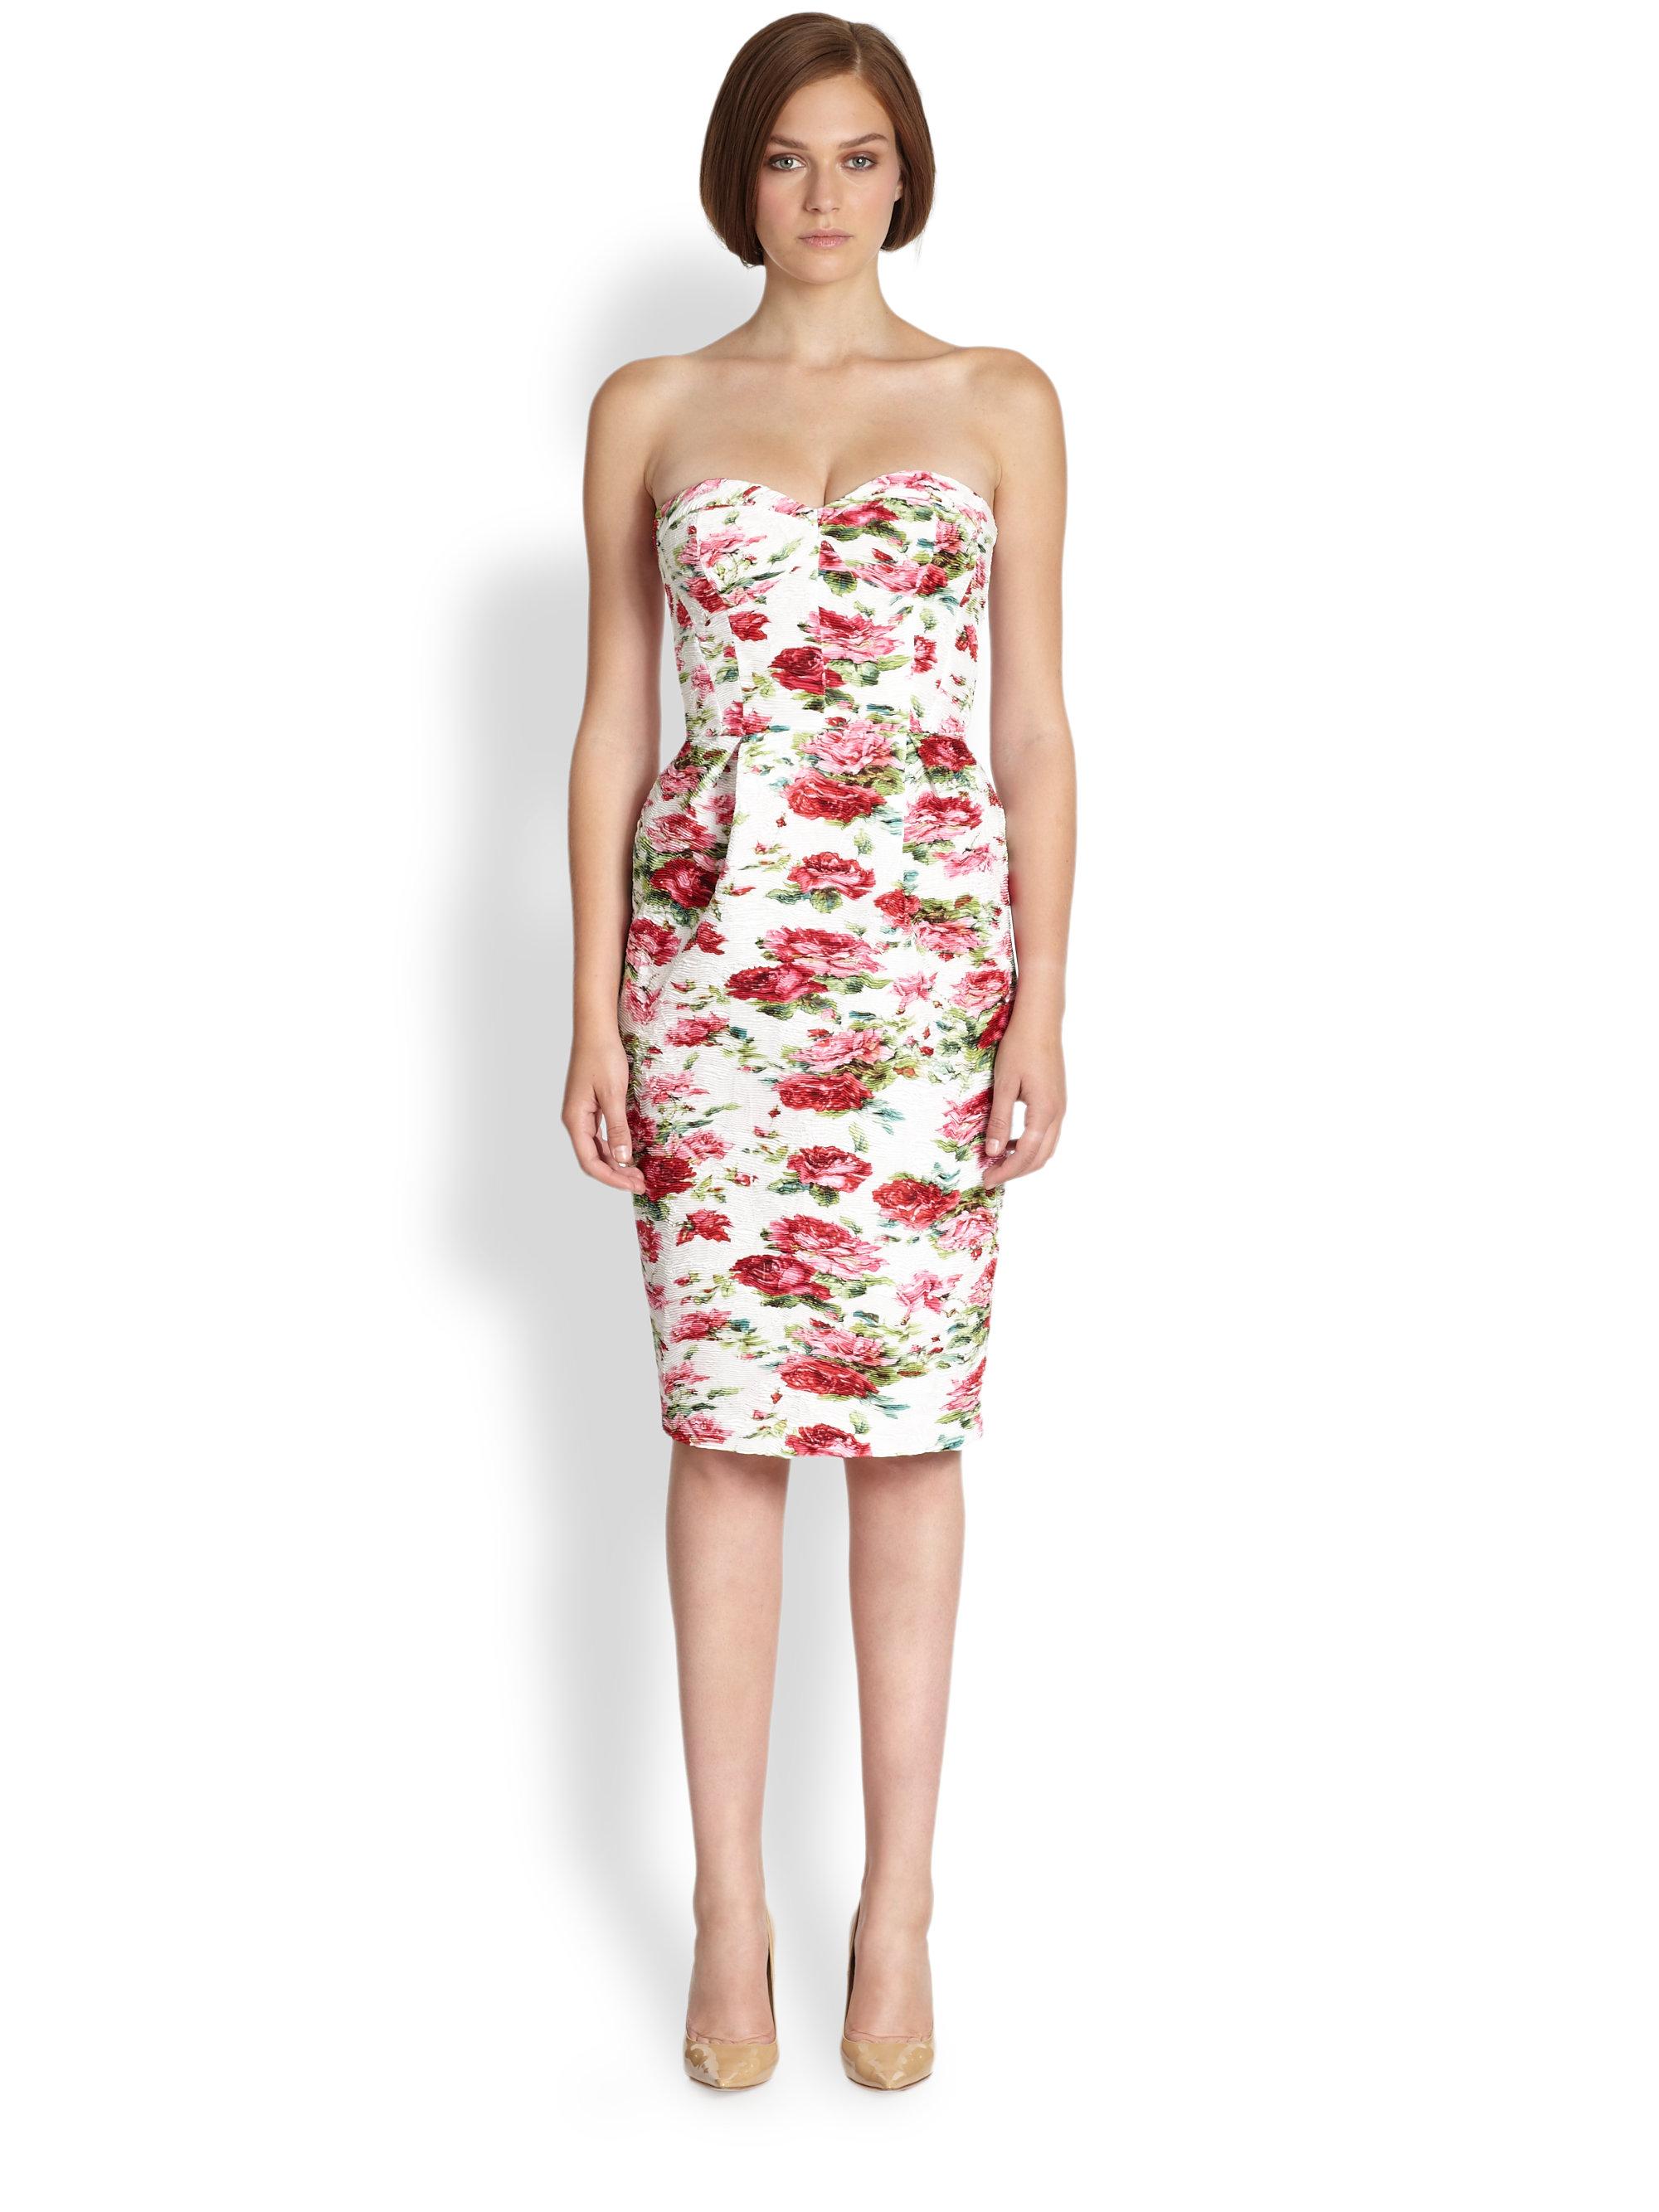 Antonio marras Strapless Rose Print Bustier Dress in Pink - Lyst